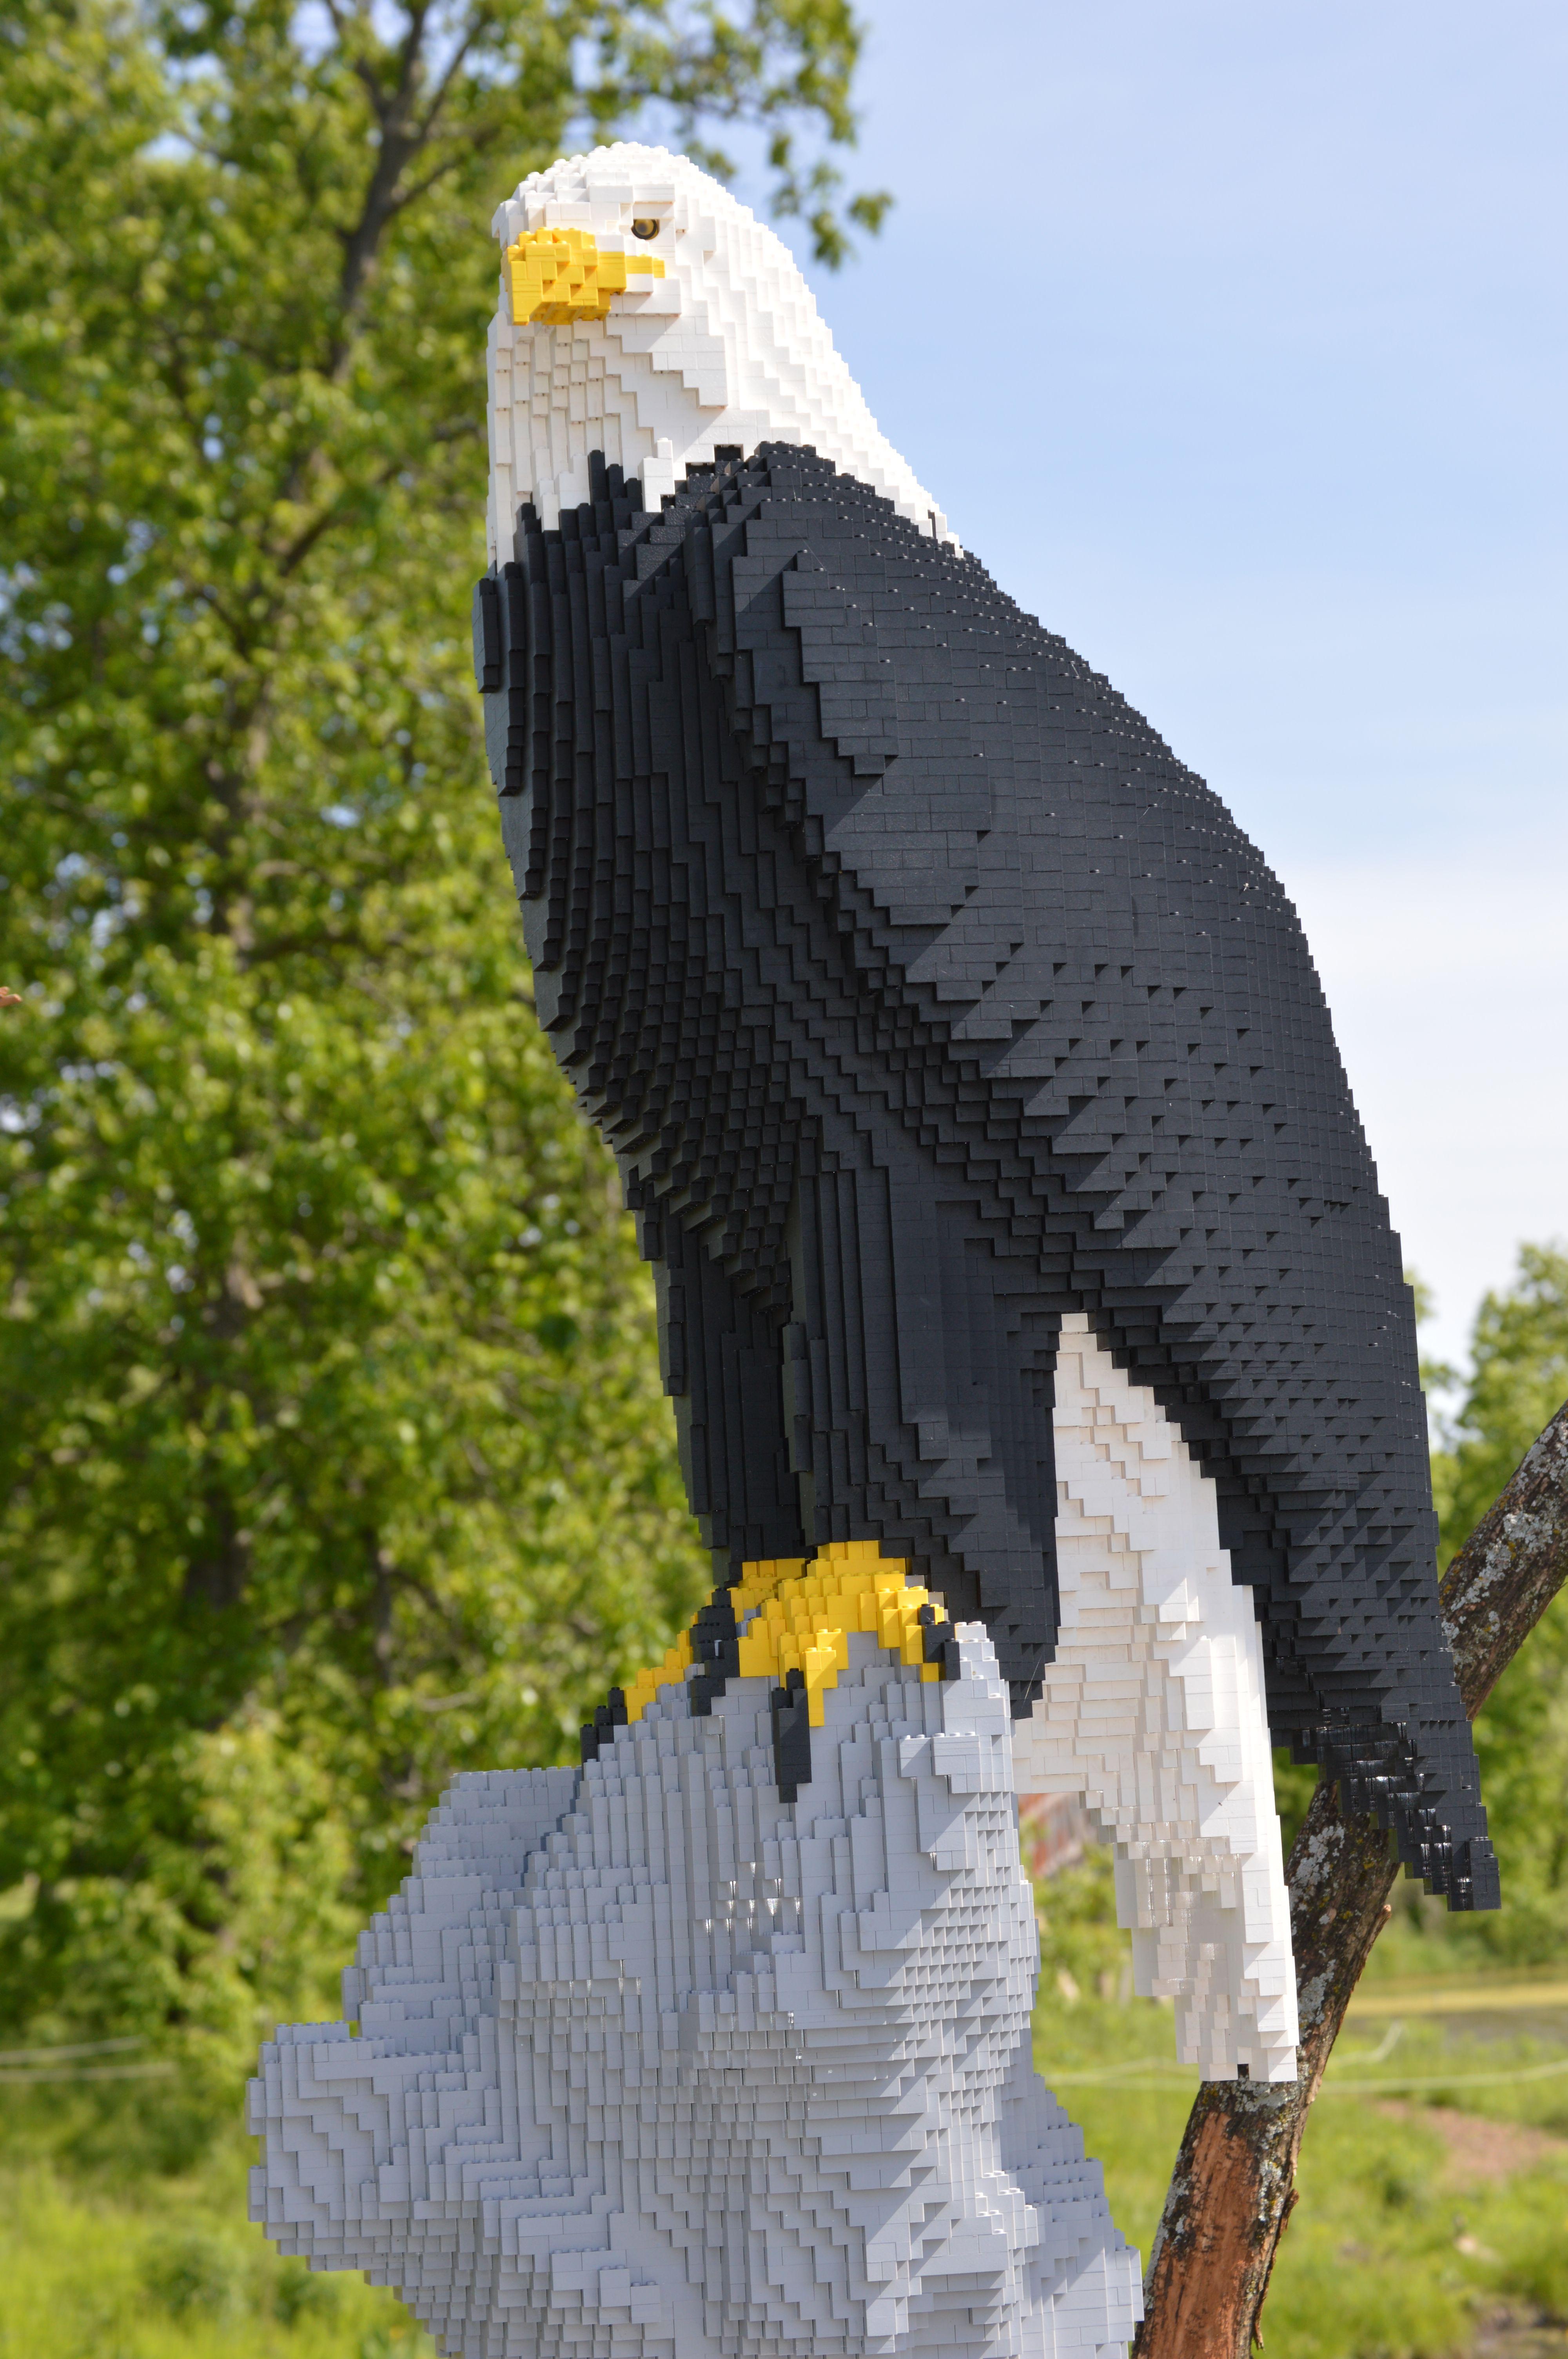 Lego Art Eagle At Powell Gardens In Missouri Art Legos